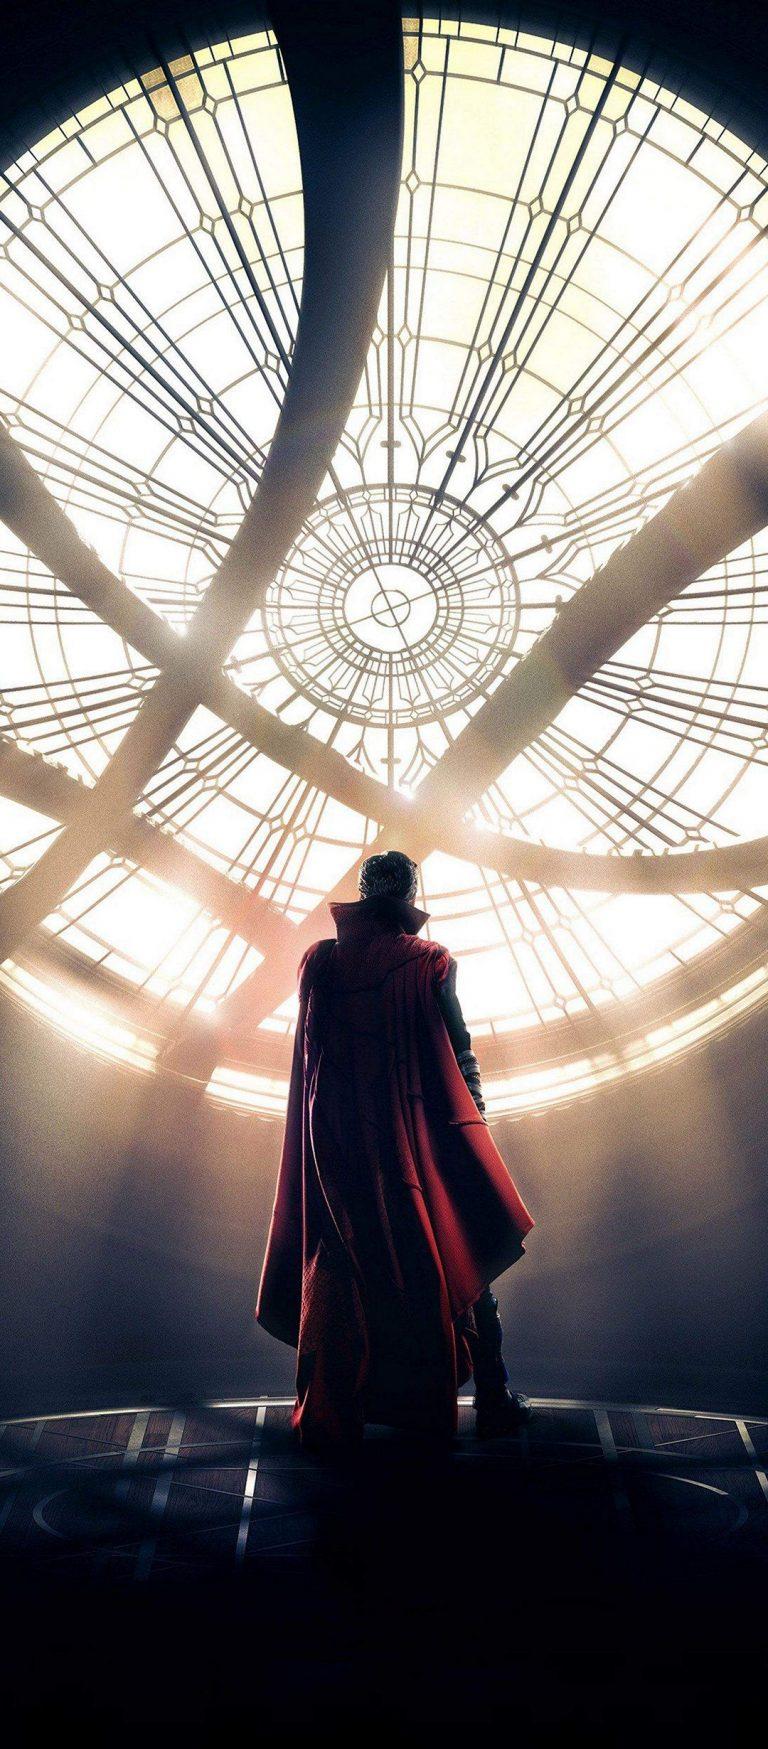 Doctor Strange Superhero 1080x2460 768x1749